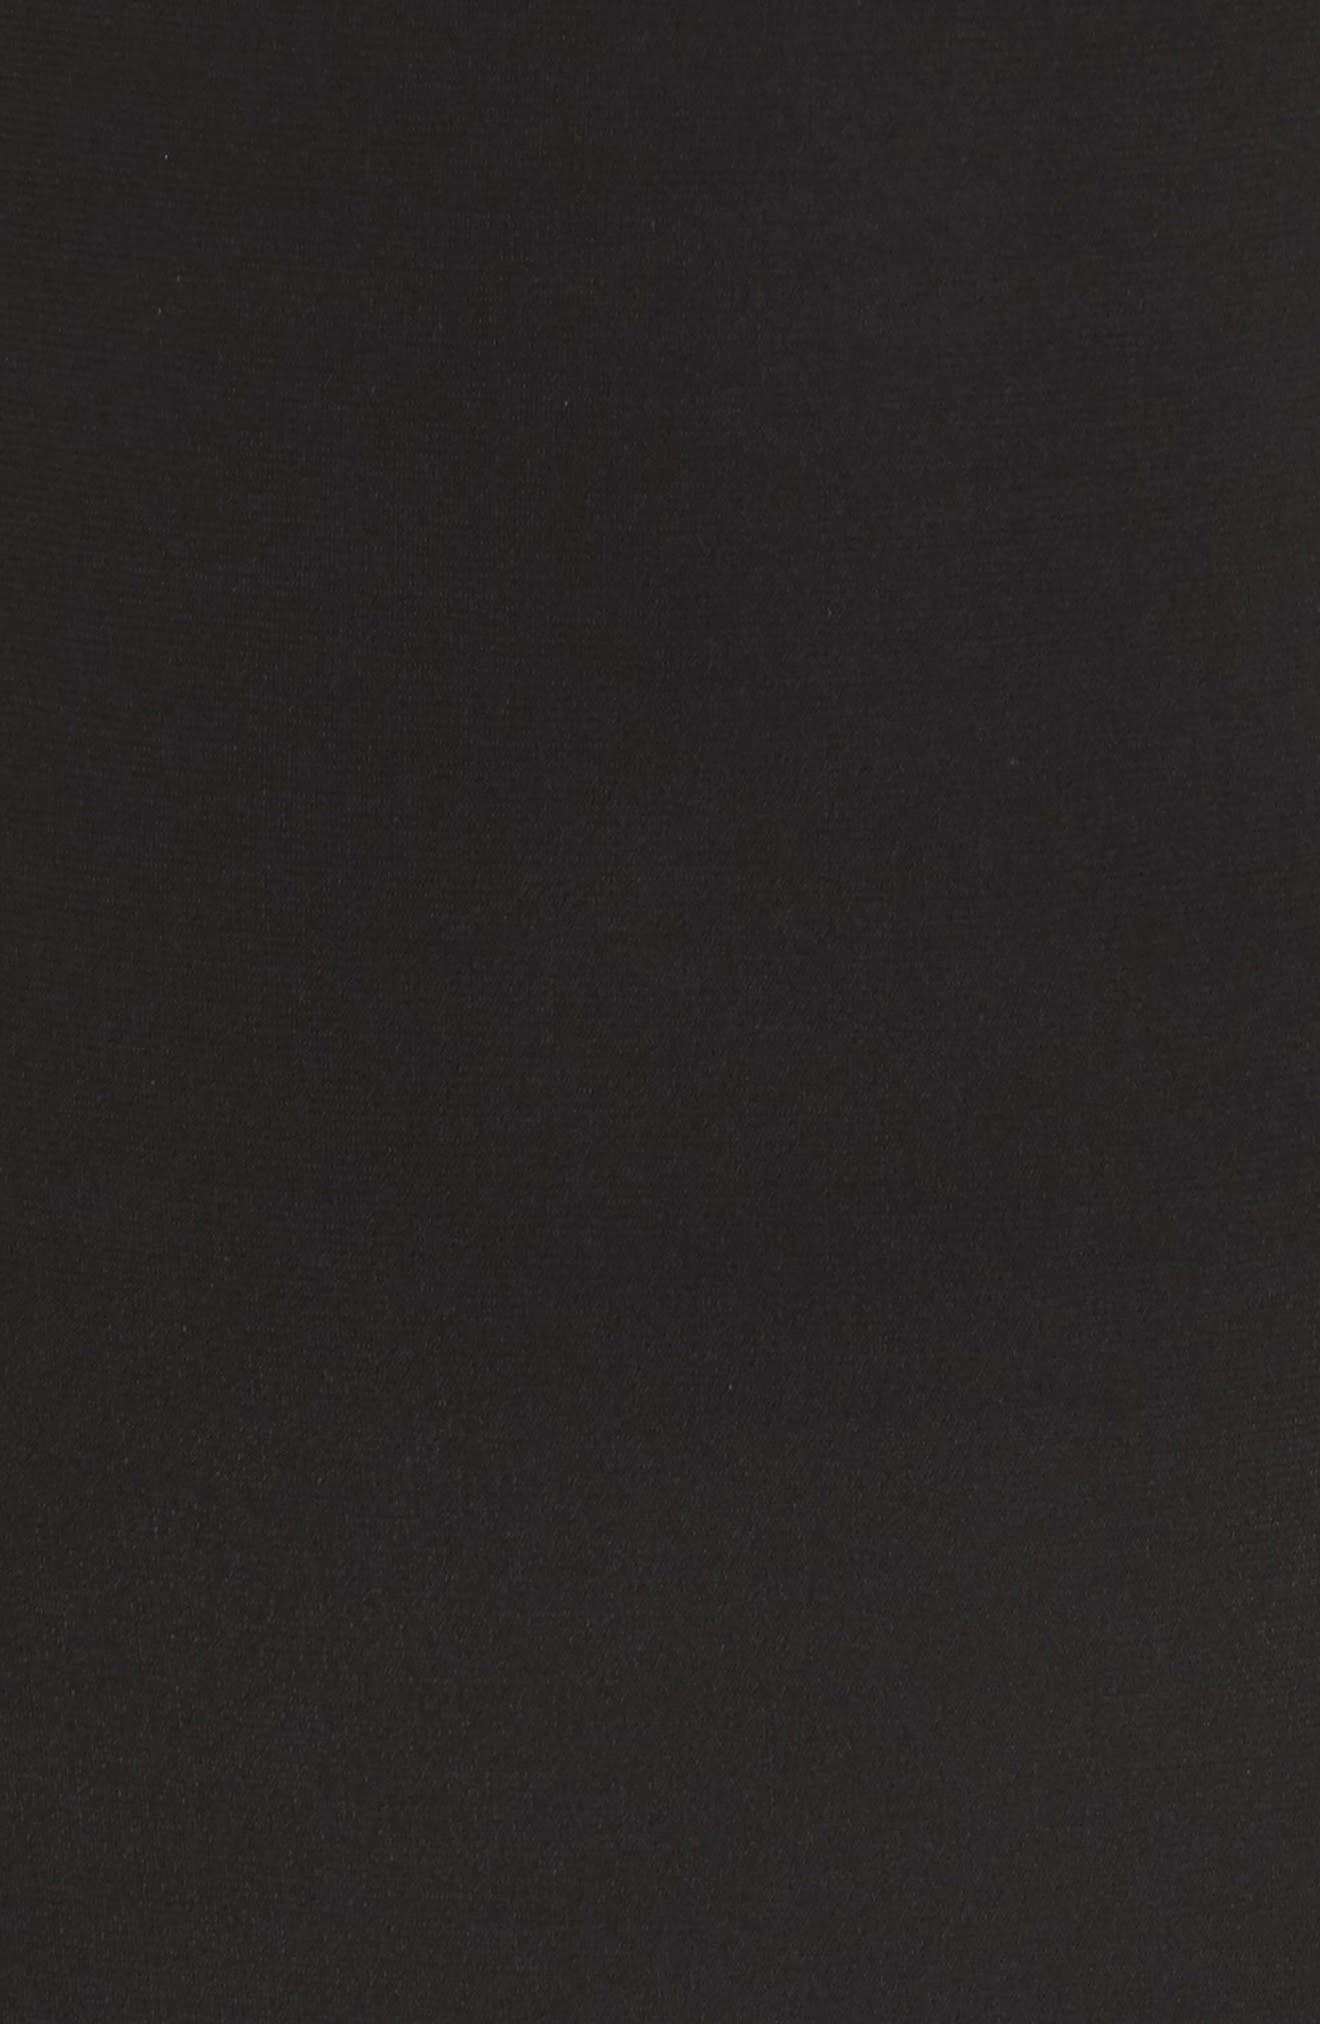 Caviar Beading Keyhole Dress,                             Alternate thumbnail 5, color,                             Black/ Nude/ Silver